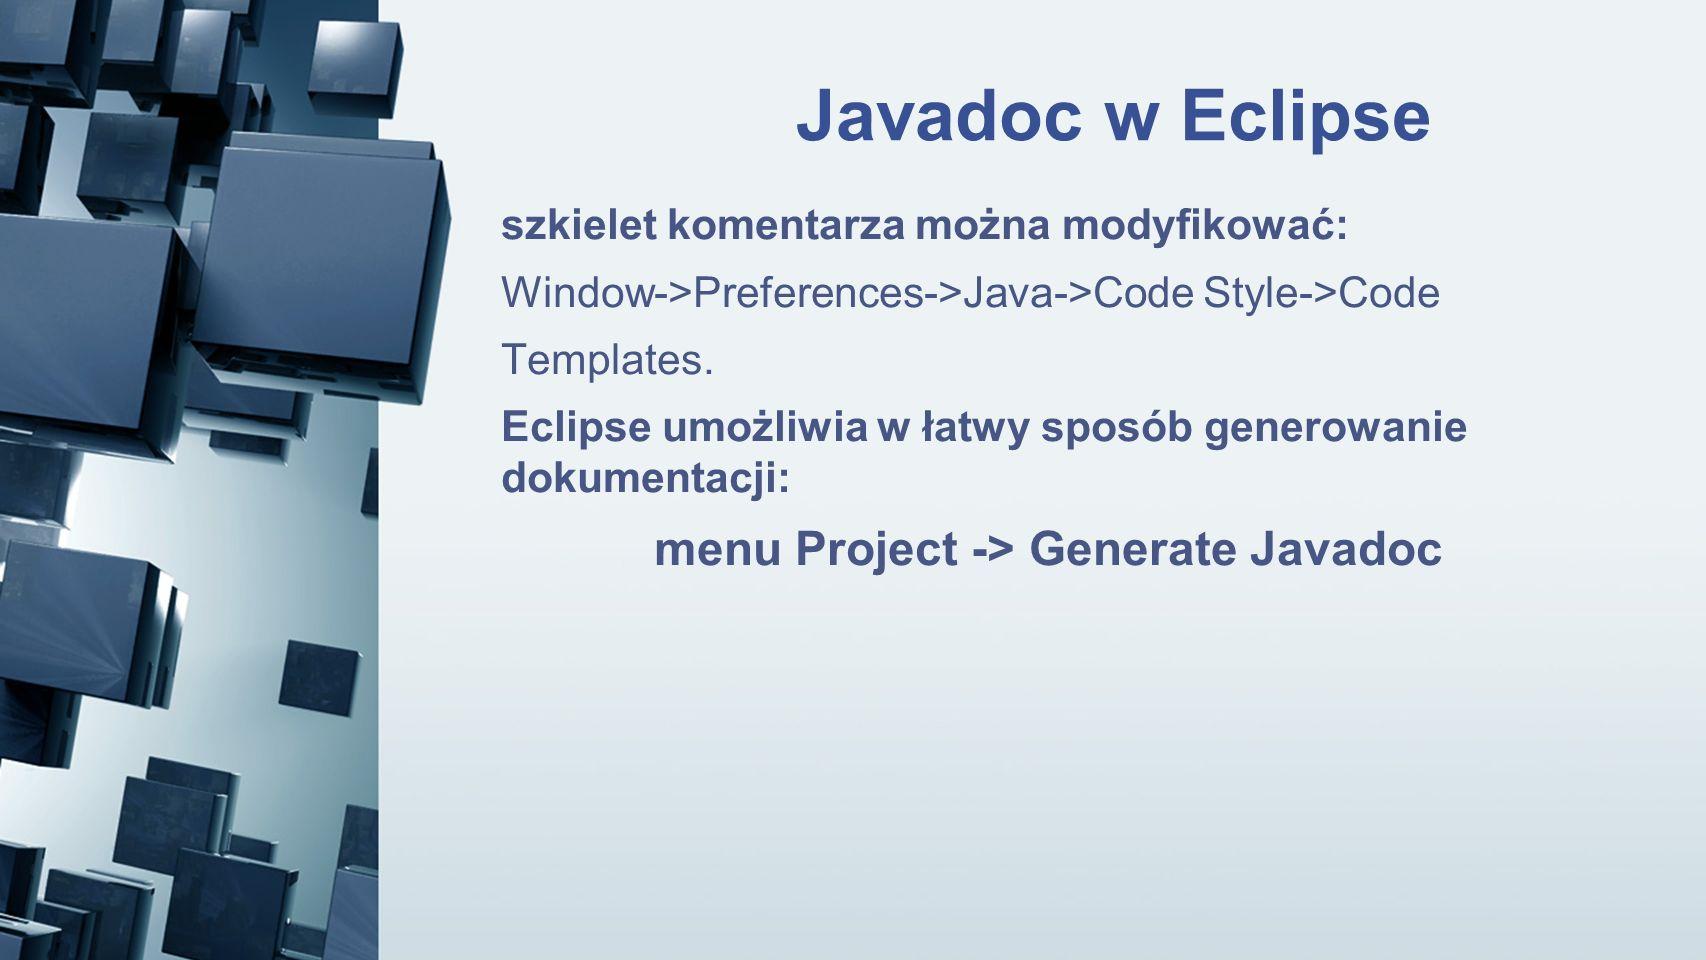 menu Project -> Generate Javadoc